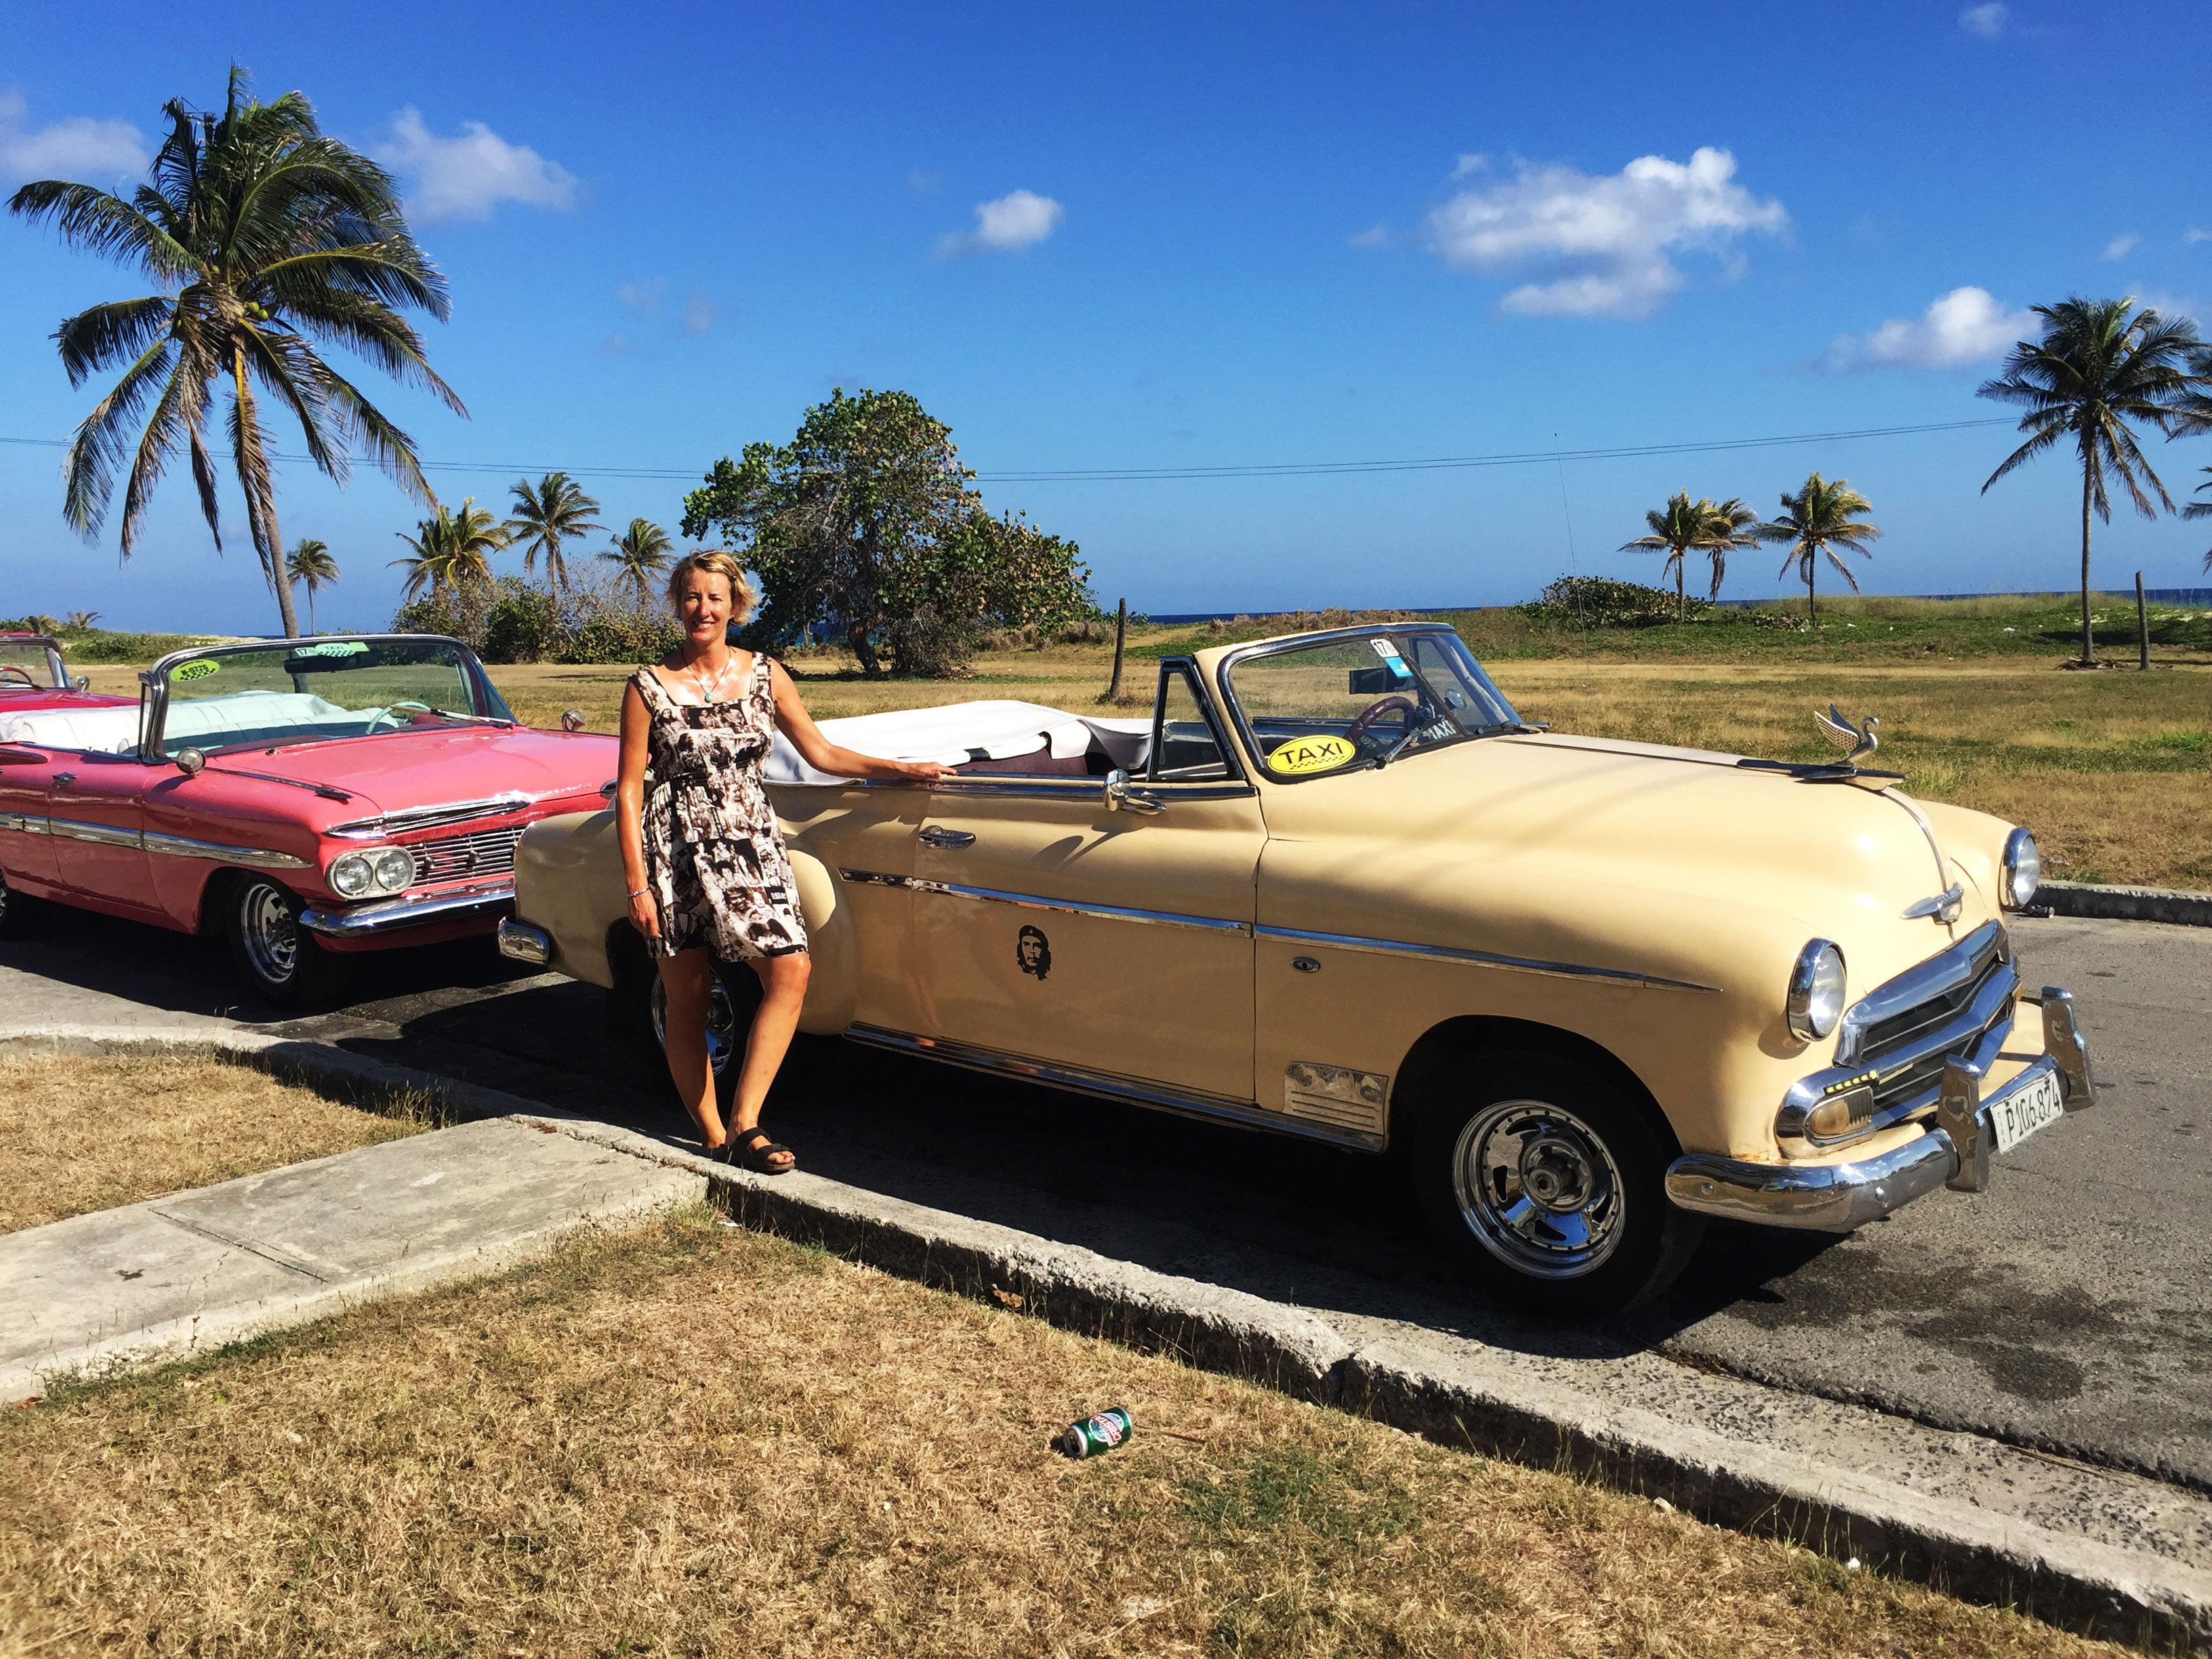 SueWhereWhyWhat & a Classic yellow Cuban convertible taxi Havana, Cuba